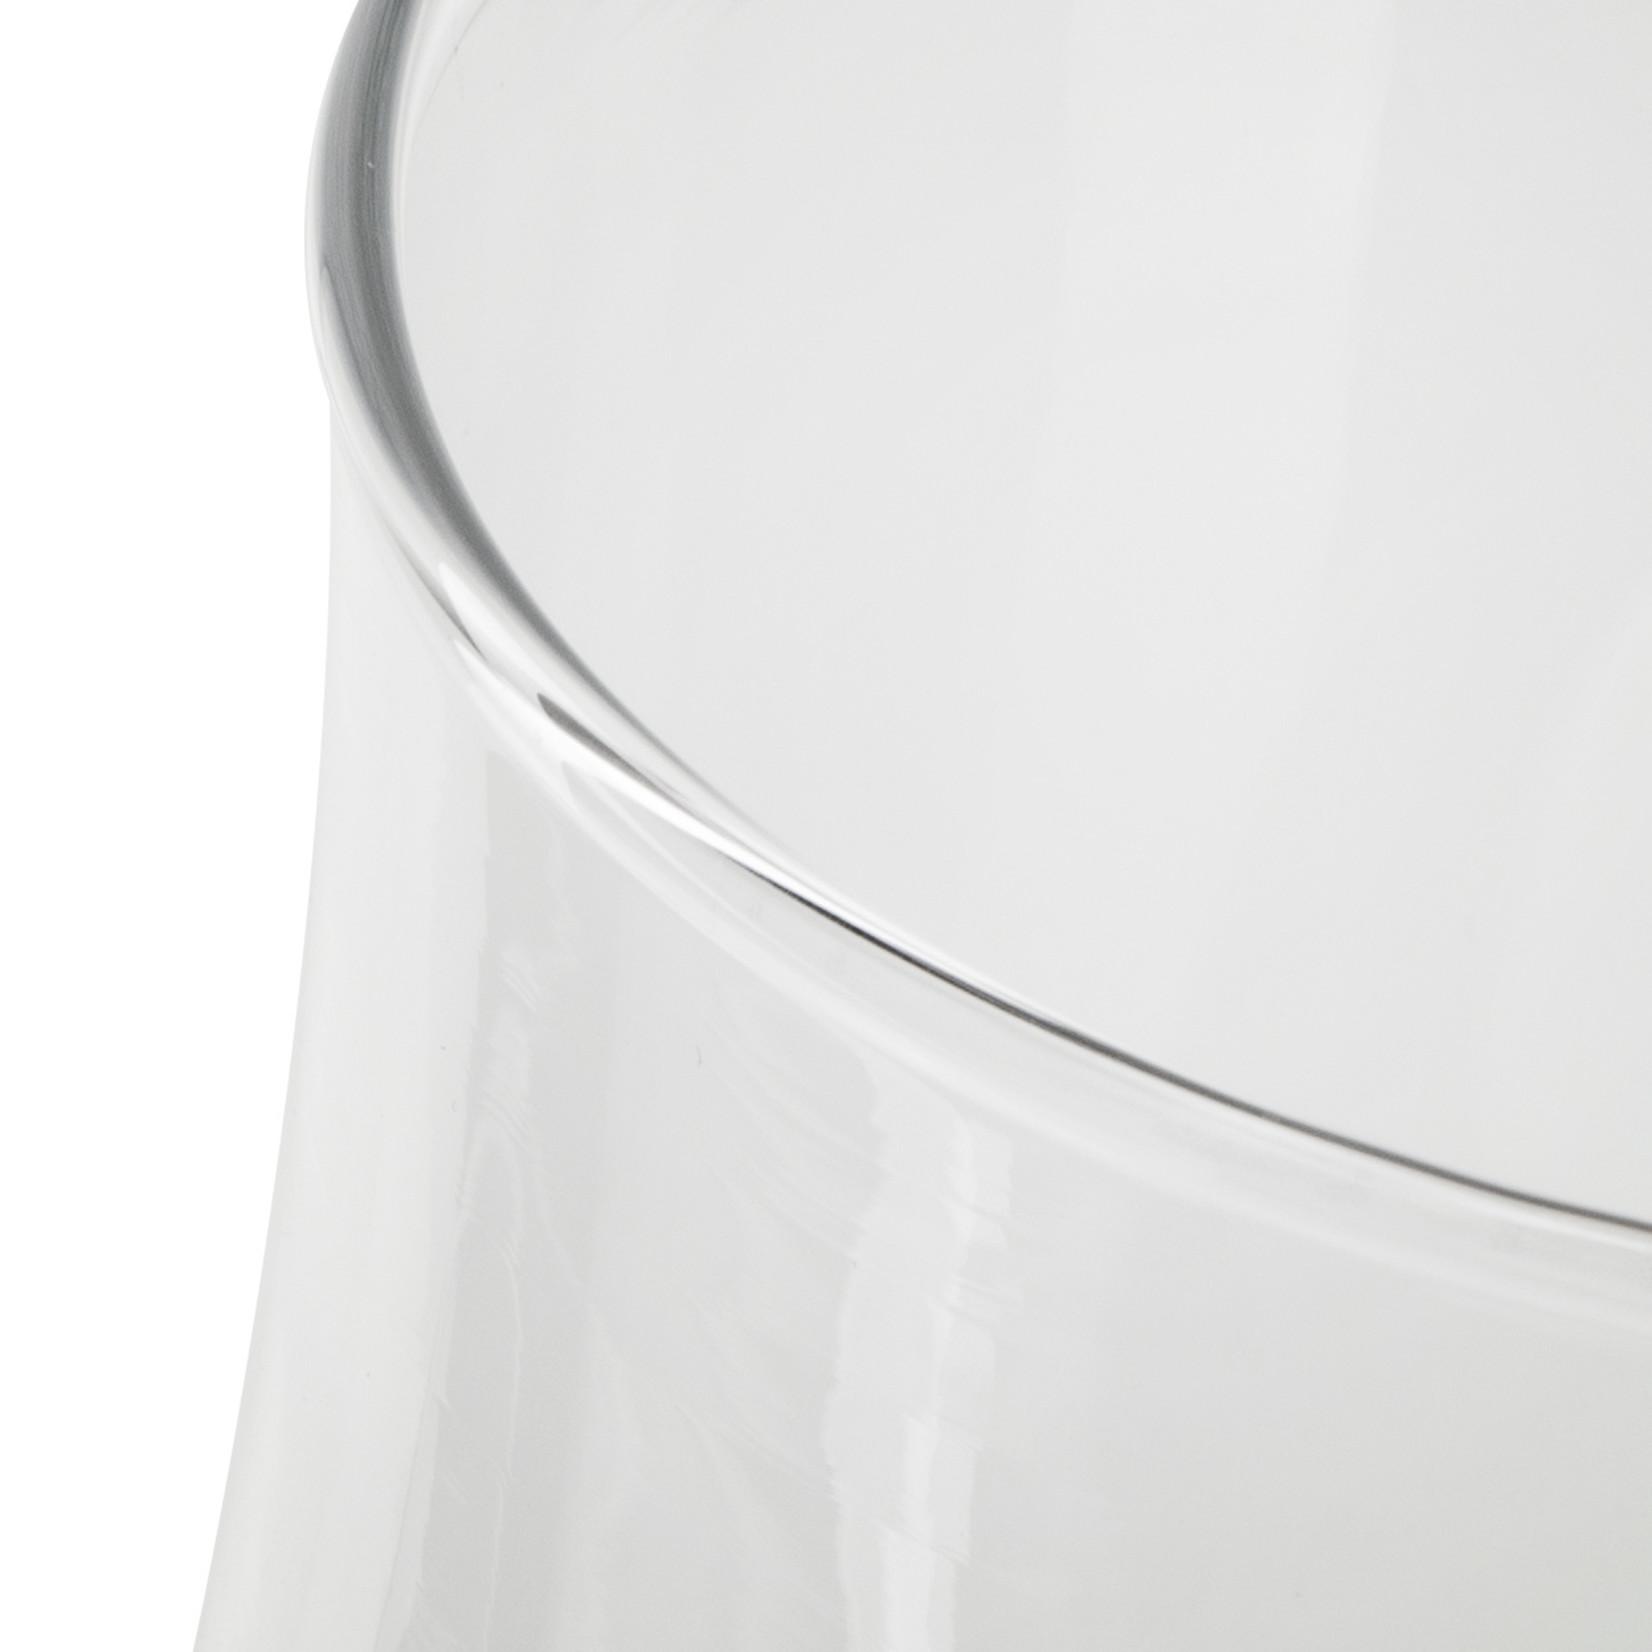 Jodeco Glass Vaas 'Femke' H21 D19 cm Transparant